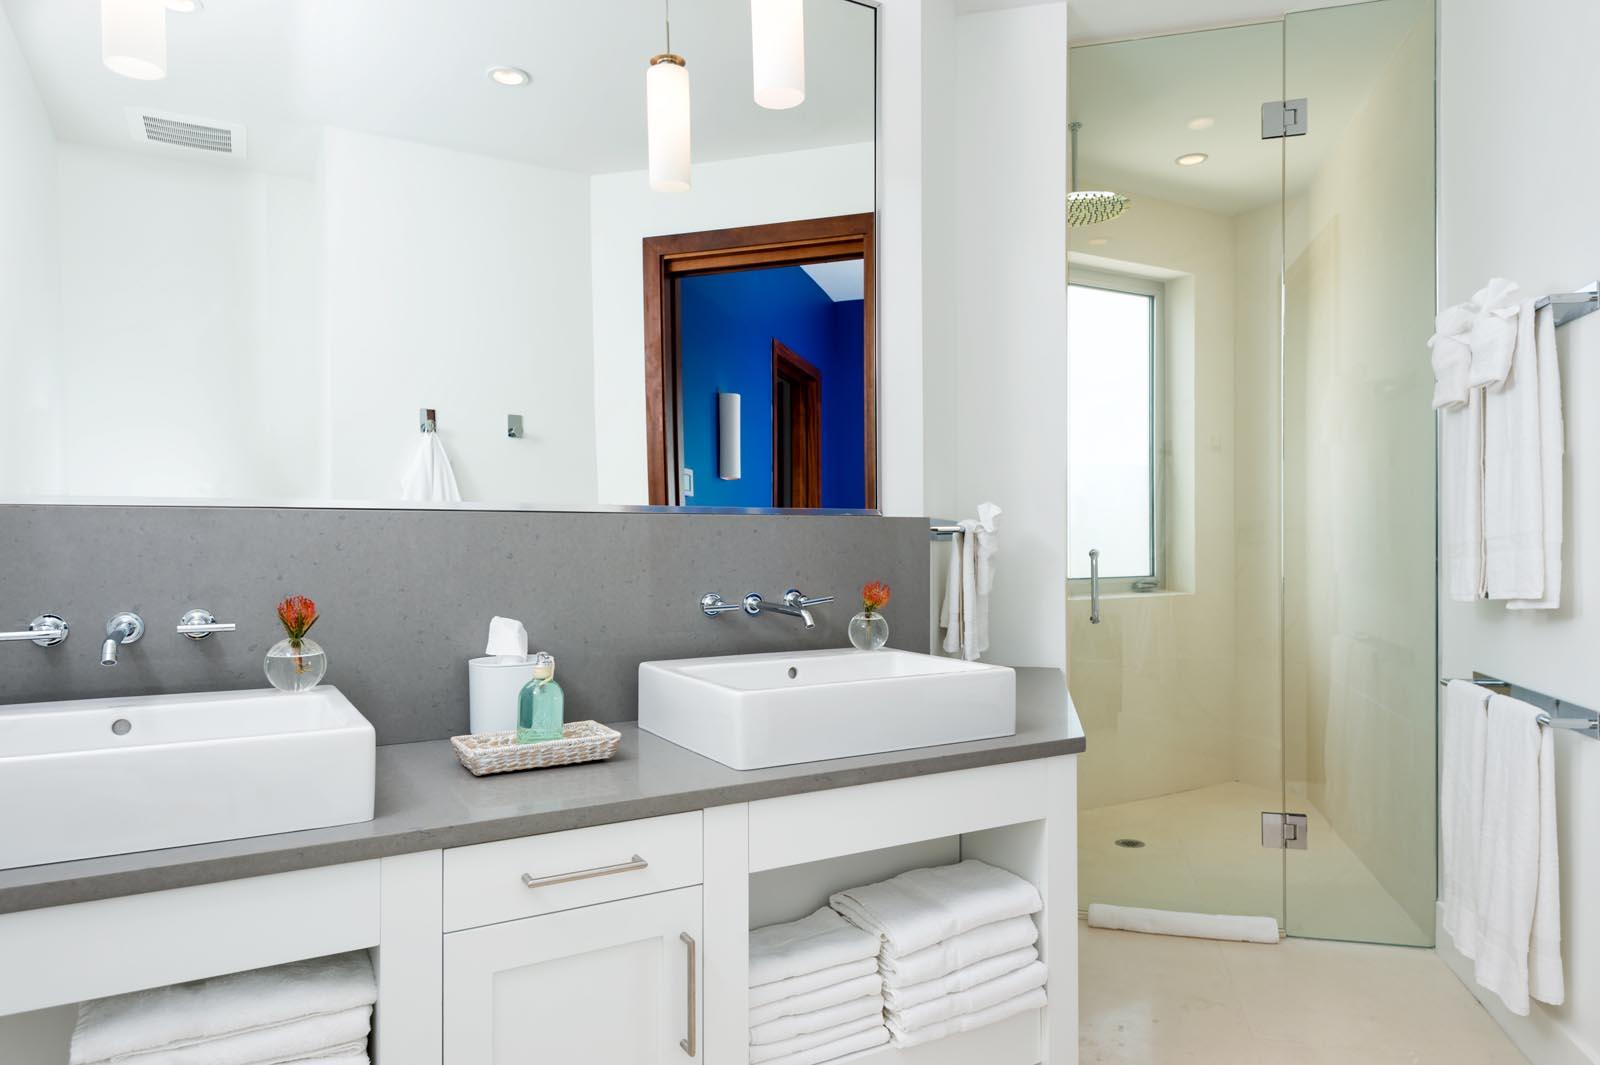 Each master bedroom has a private, ensuite bathroom at Villa Aguaribay, Long Bay Beach, Providenciales (Provo), Turks and Caicos Islands.